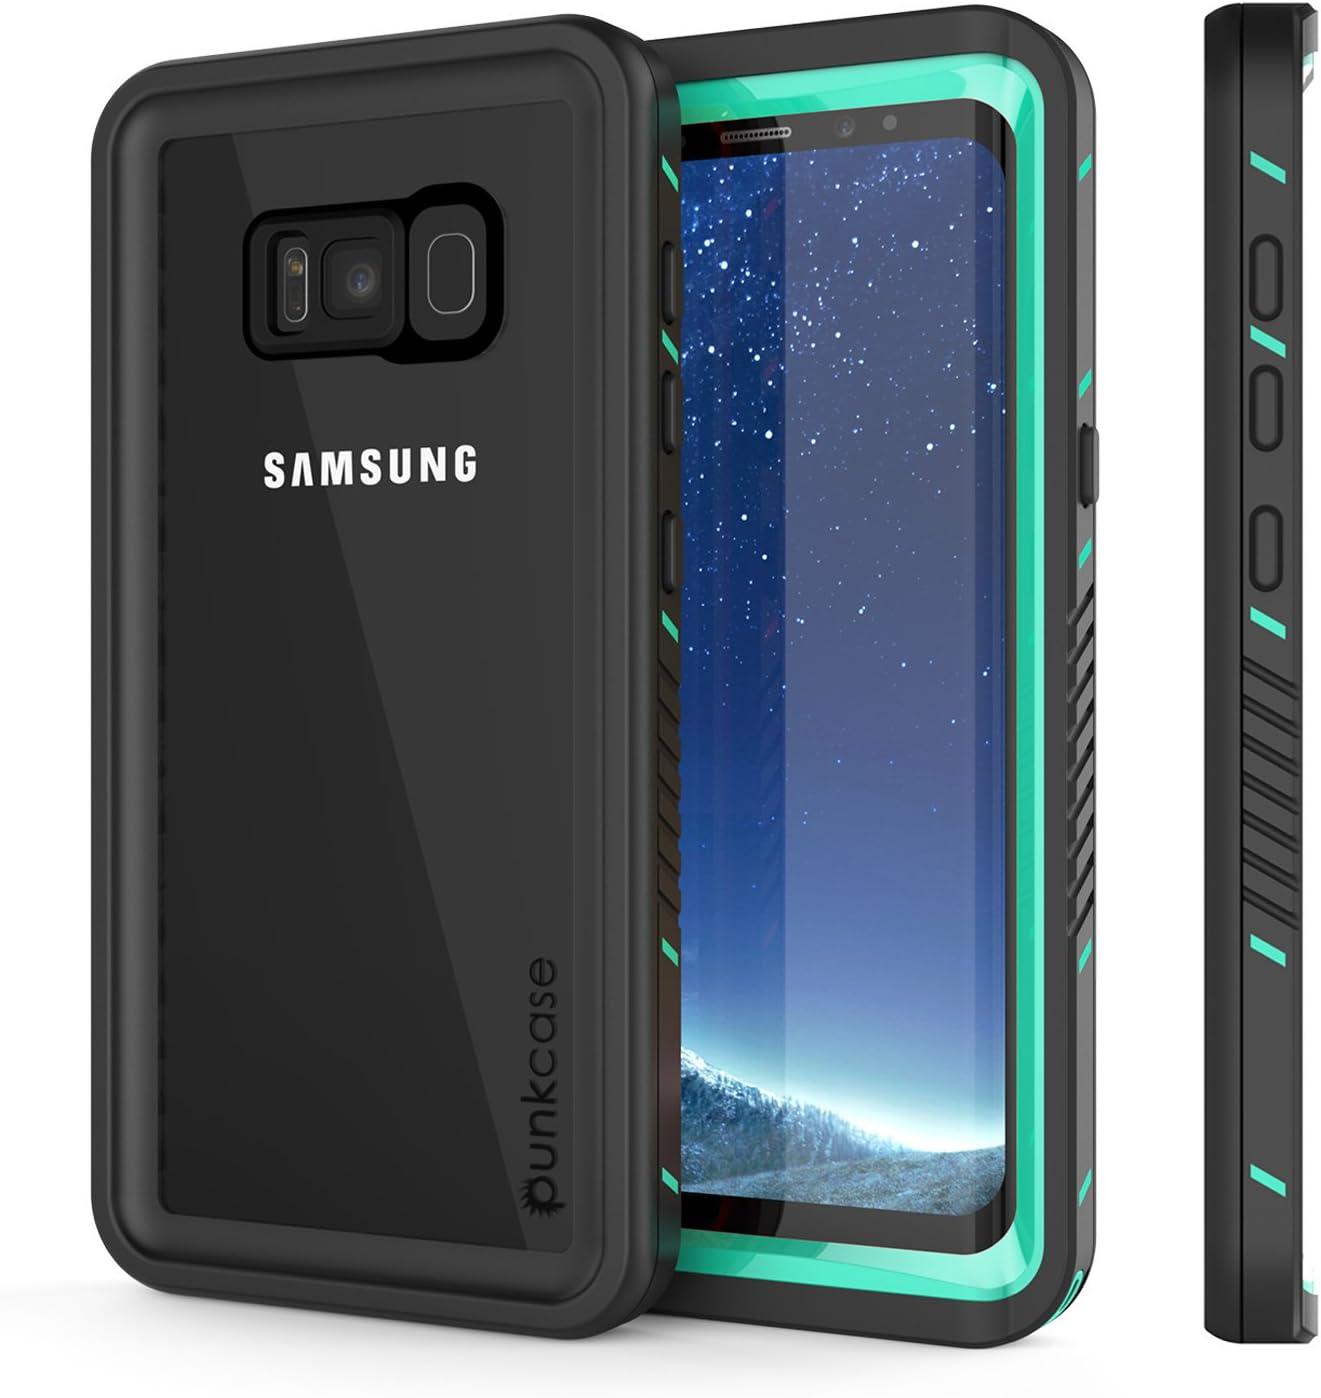 Galaxy Superlatite S8 Plus Waterproof Case Some reservation Series Extreme Slim Punkcase